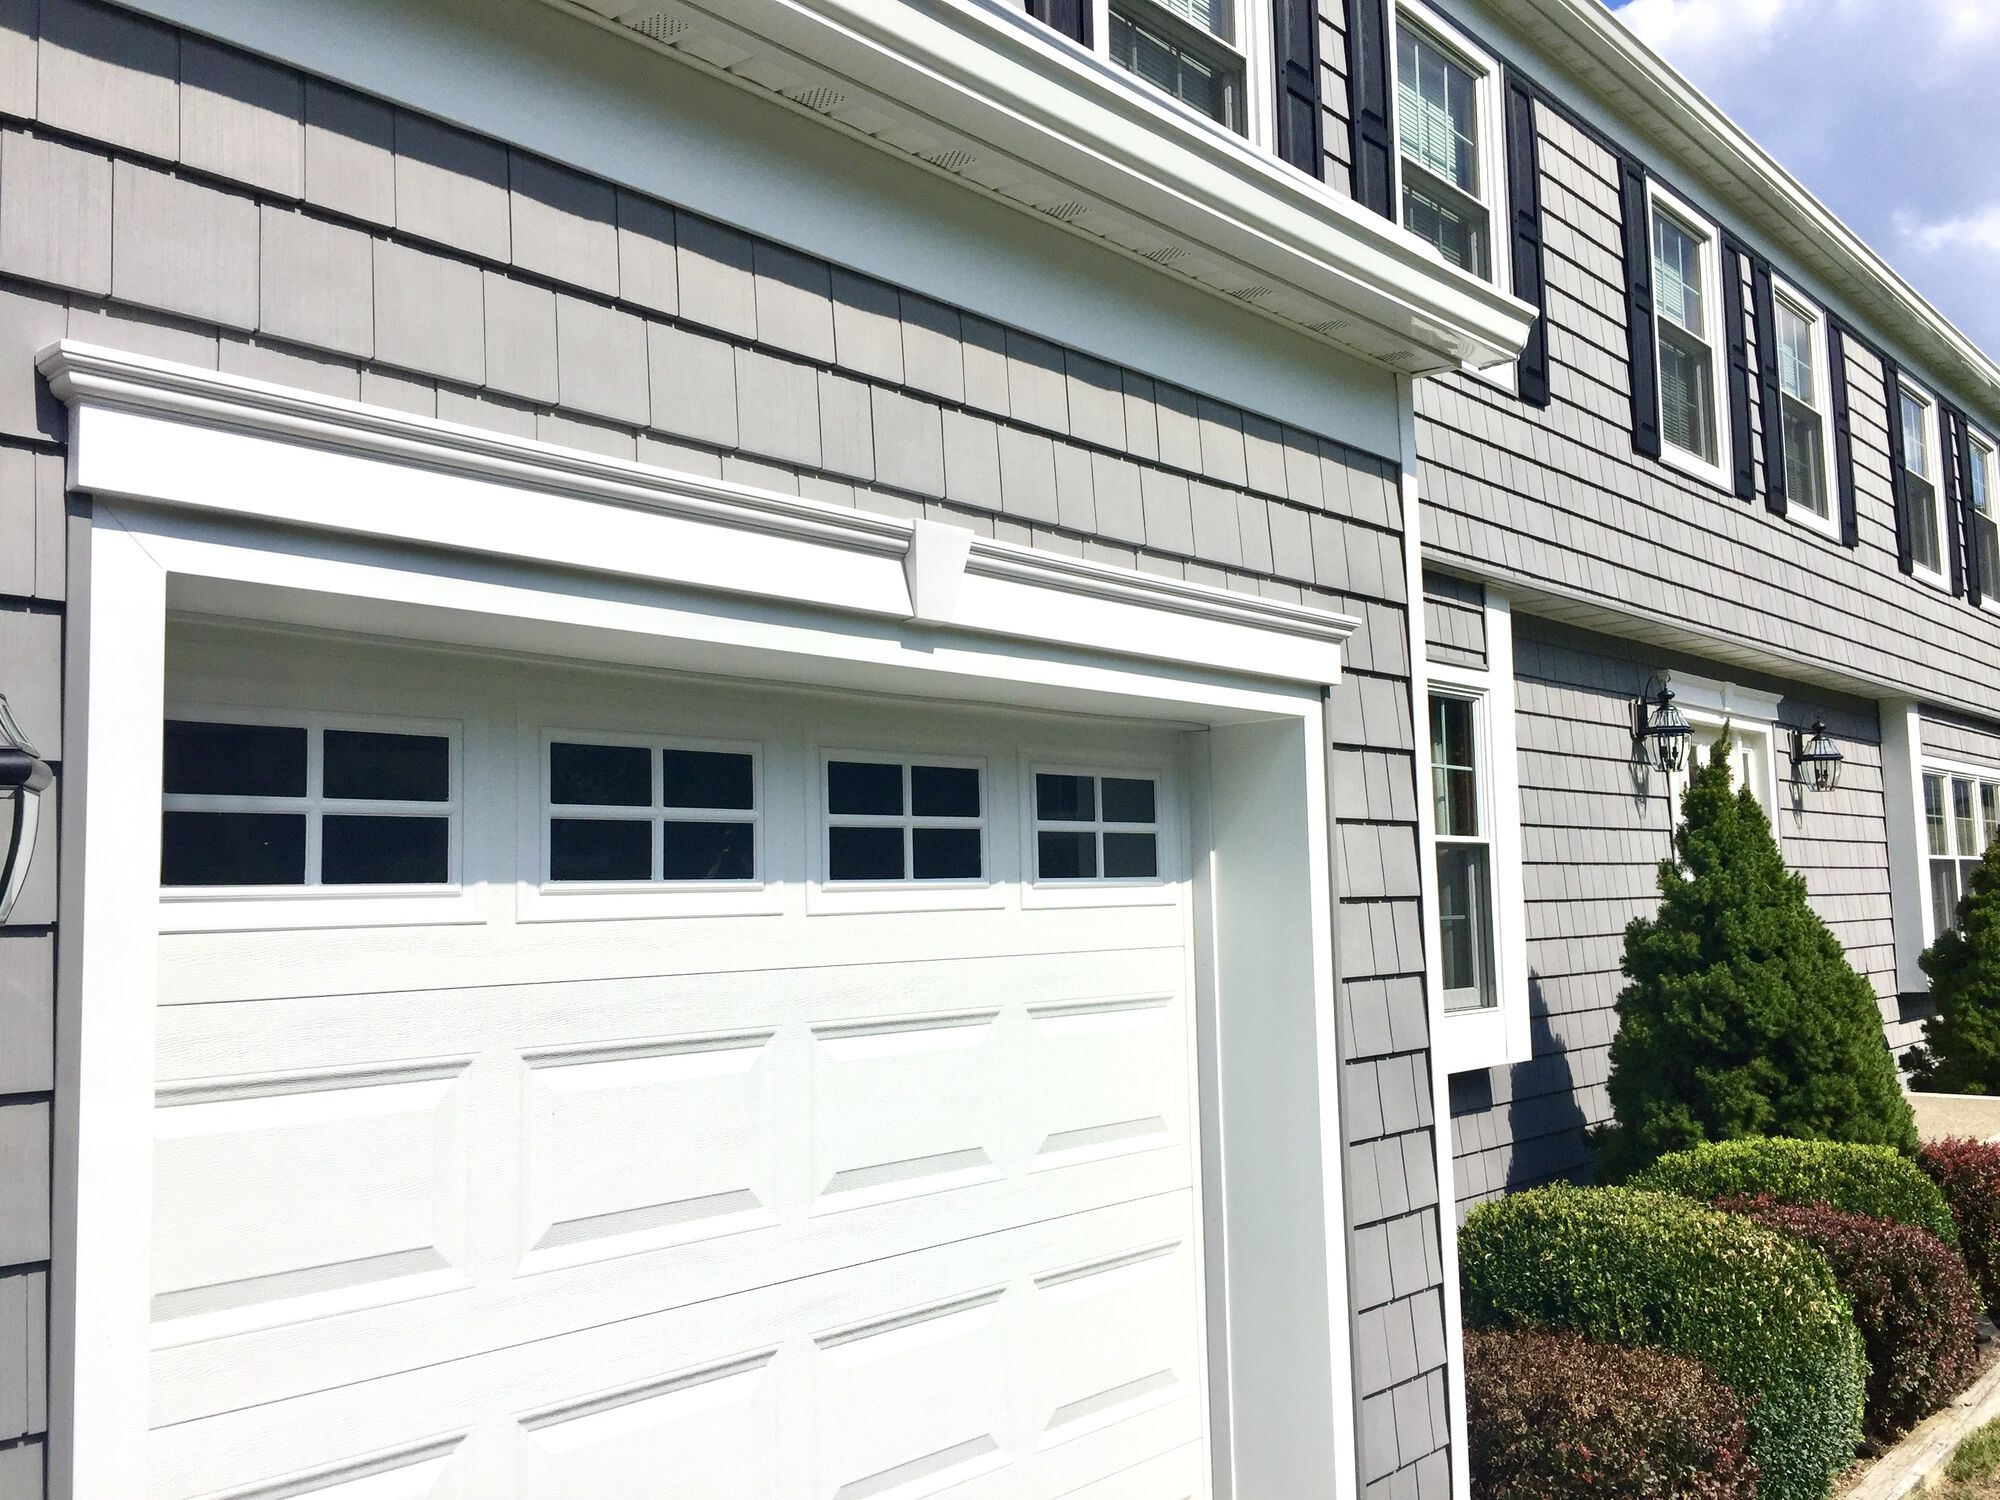 Certainteed Siding and Gaf Roofing in Cedar Knolls NJ